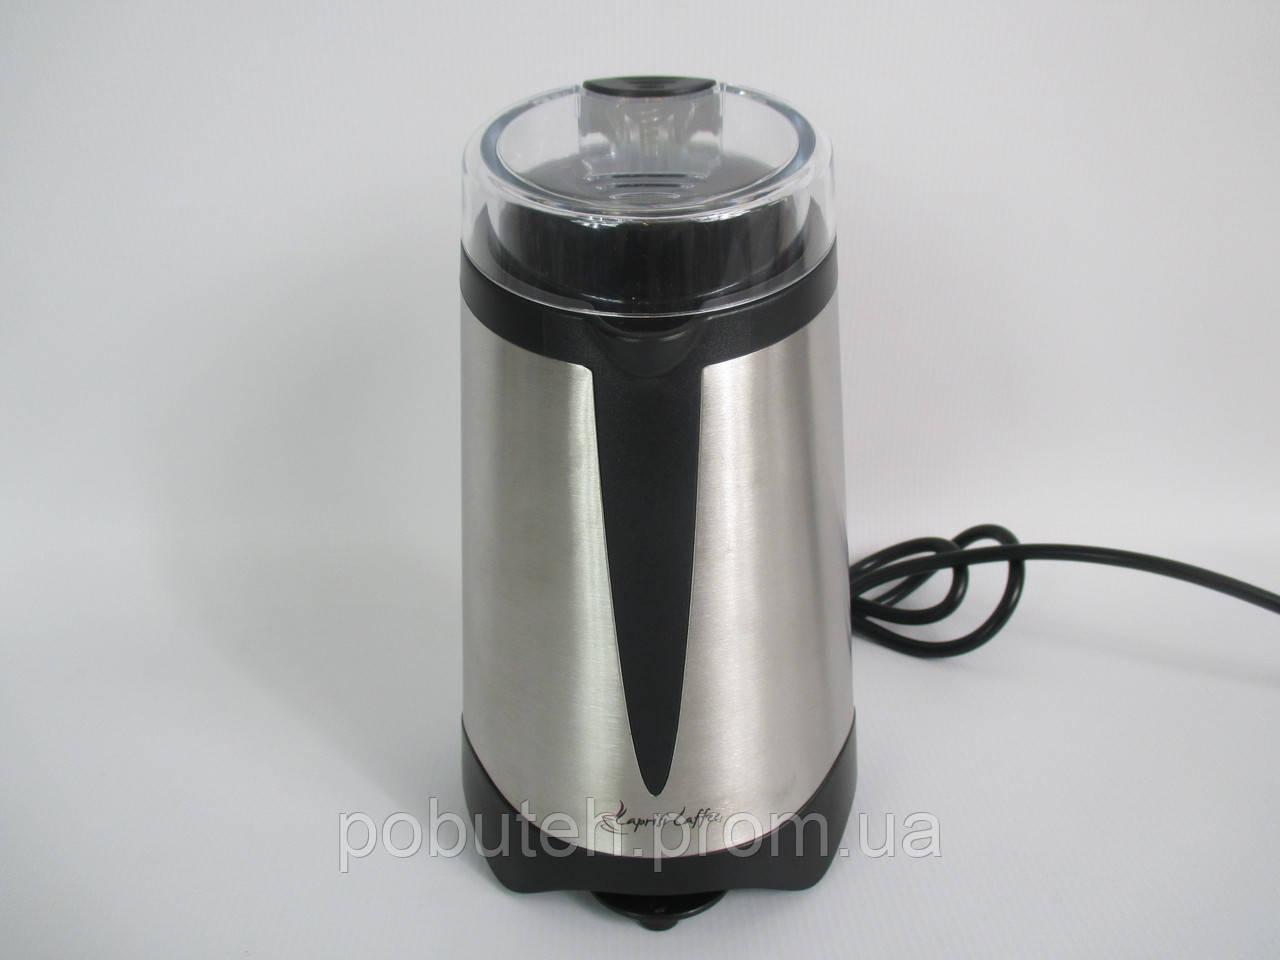 Кофемолка Westfalia INOX